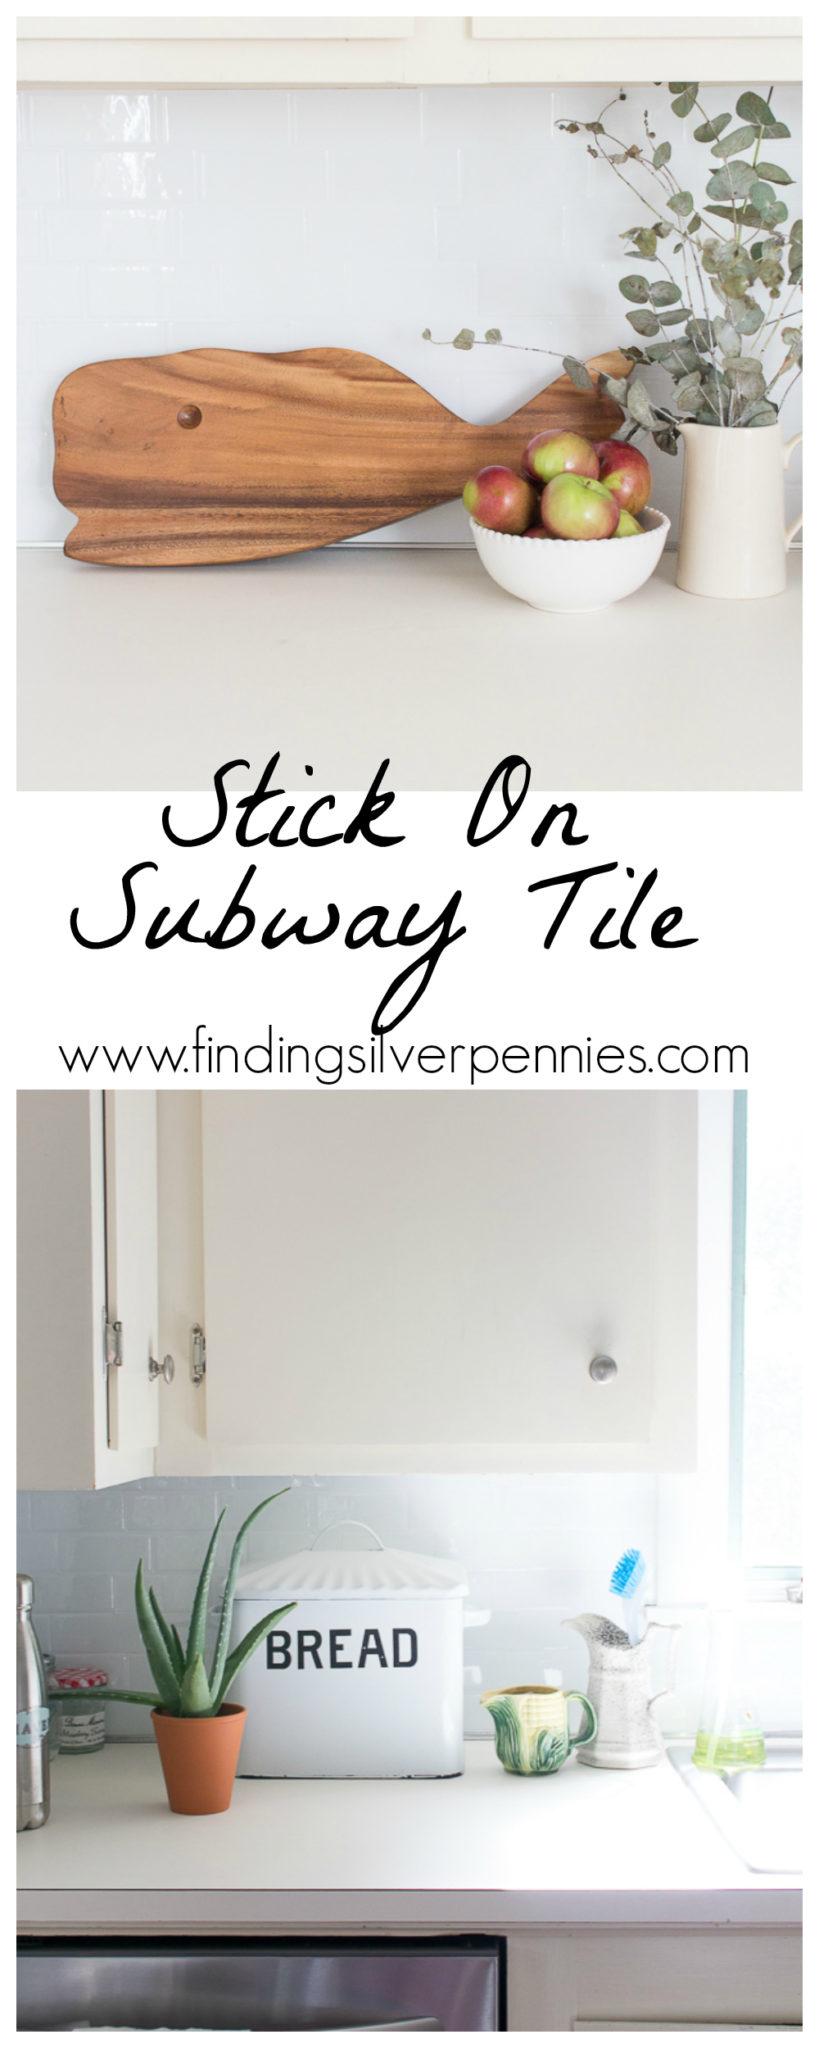 stick-on-subway-tile